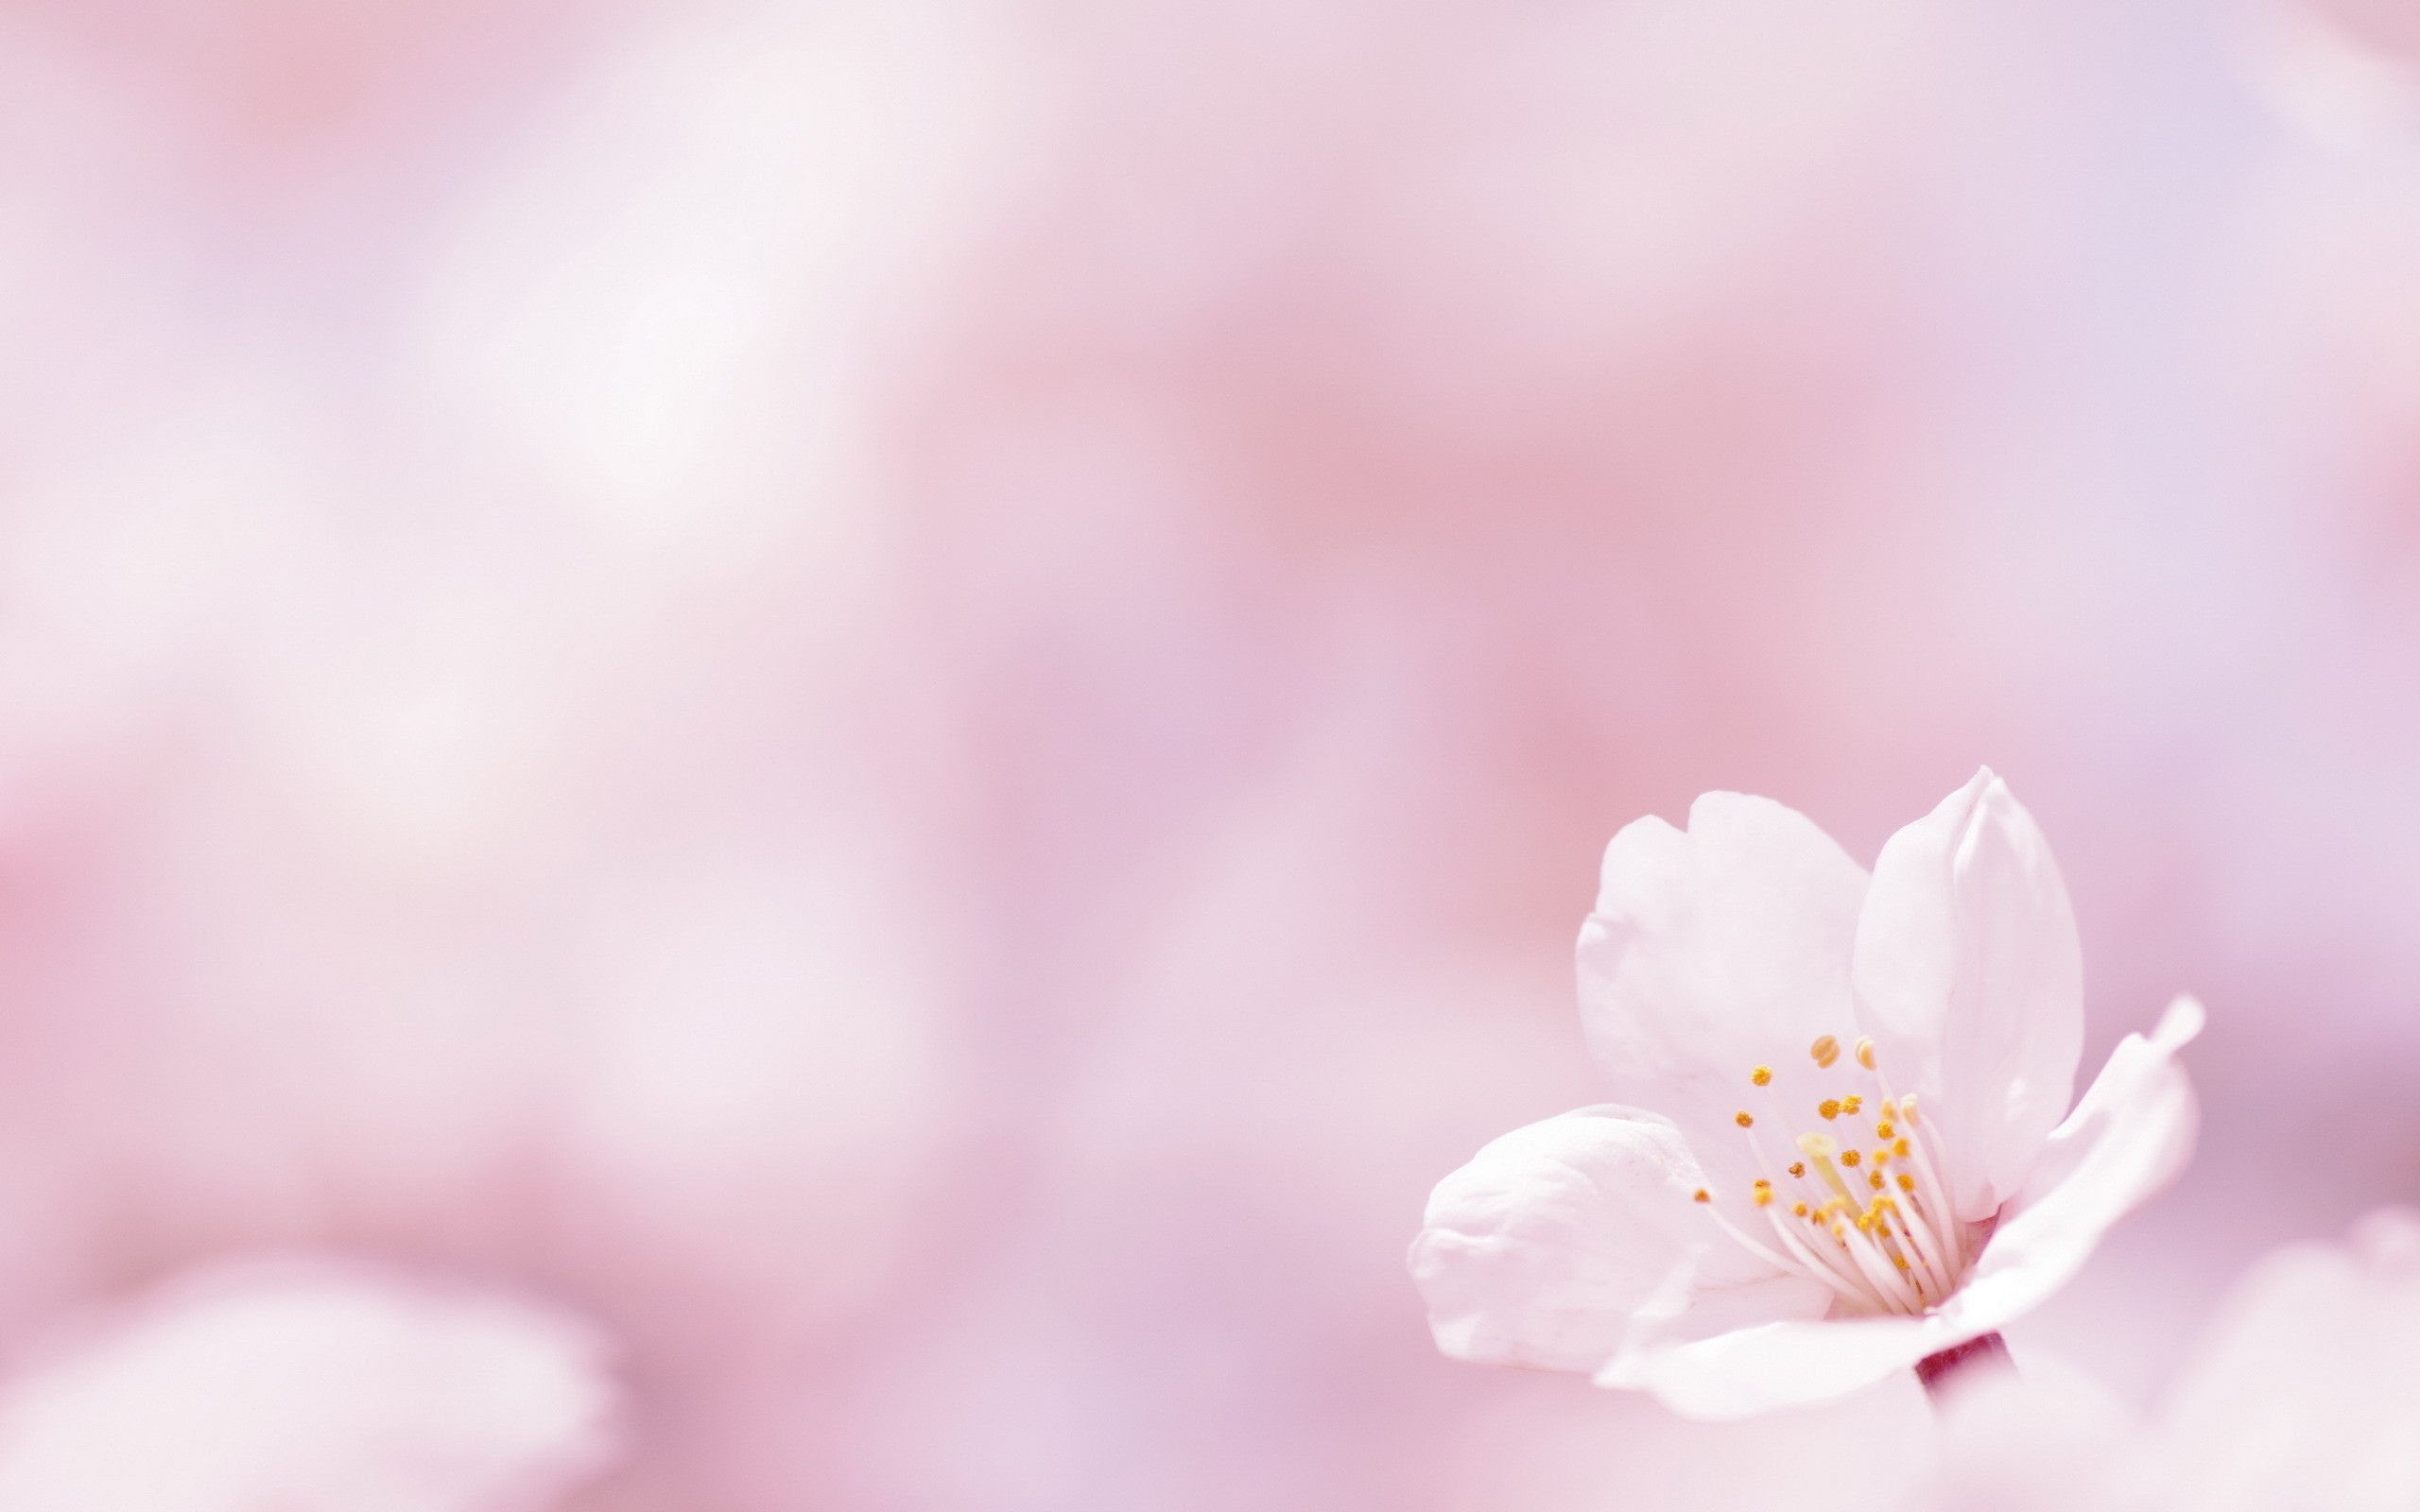 Spring Flowers Wallpaper Backgrounds Sf Wallpaper